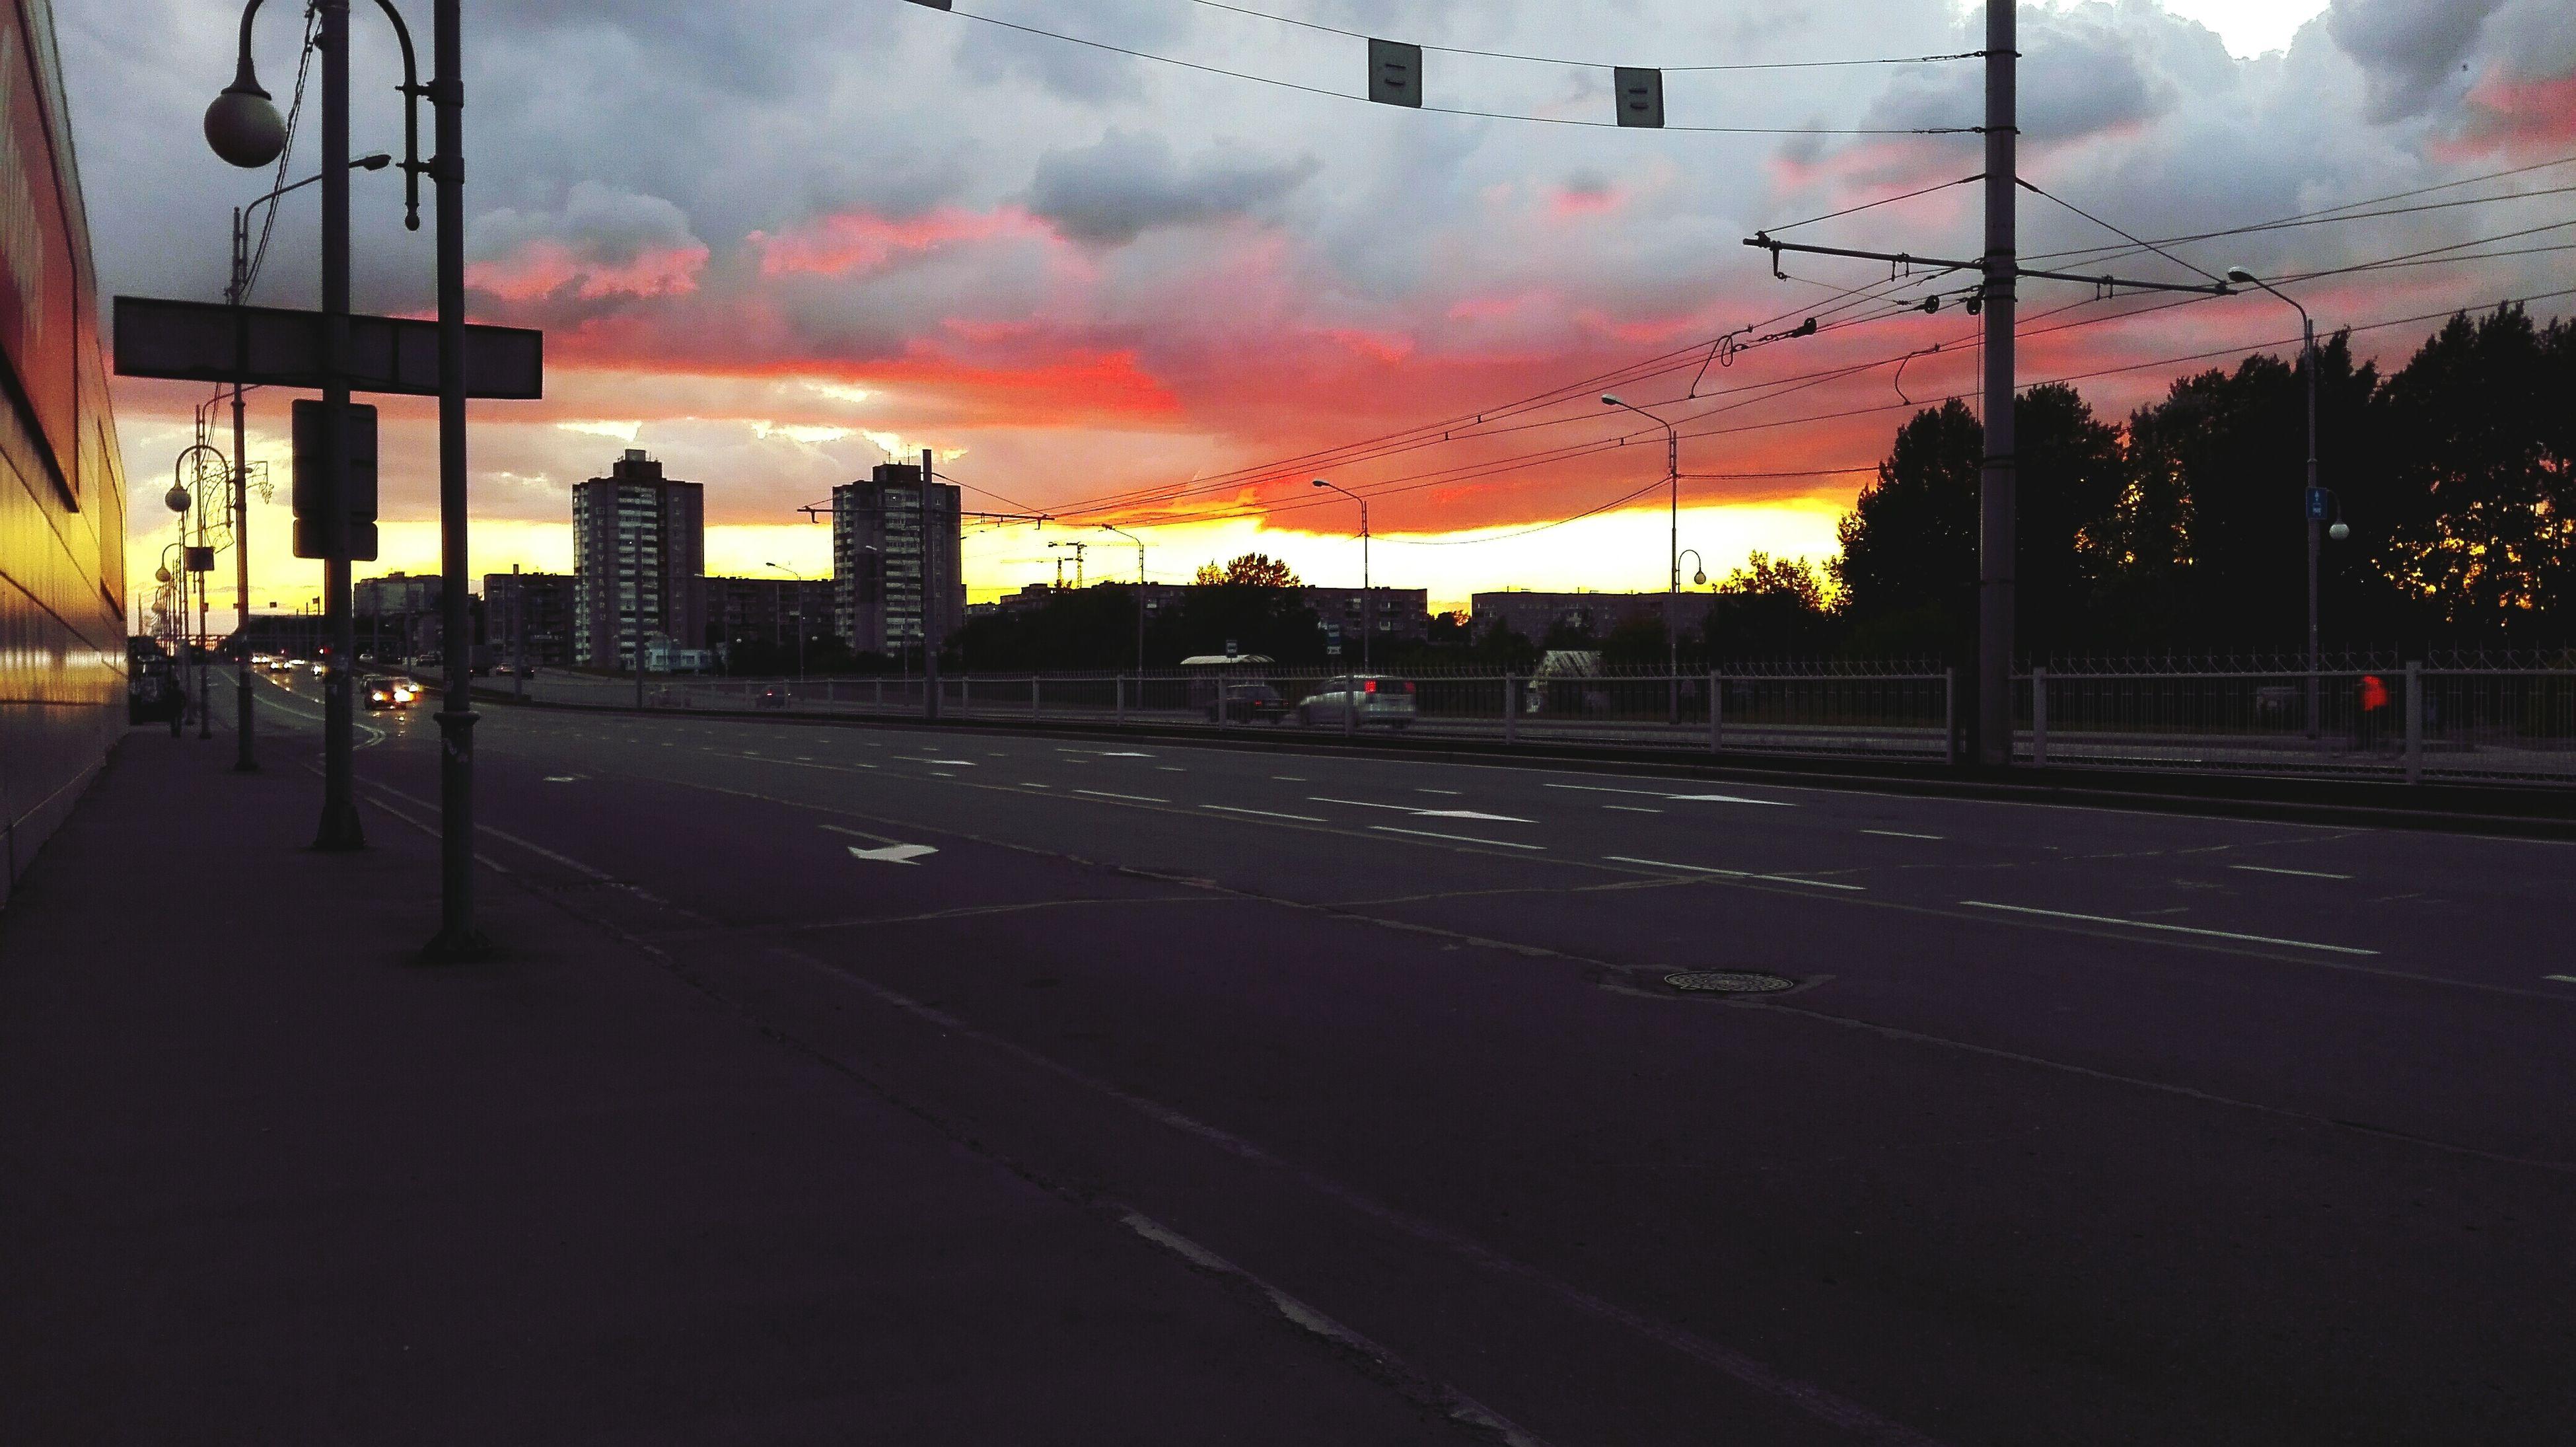 sunset, sky, building exterior, cloud - sky, architecture, orange color, built structure, transportation, city, the way forward, road, street, cloudy, street light, electricity pylon, dusk, dramatic sky, silhouette, cloud, empty